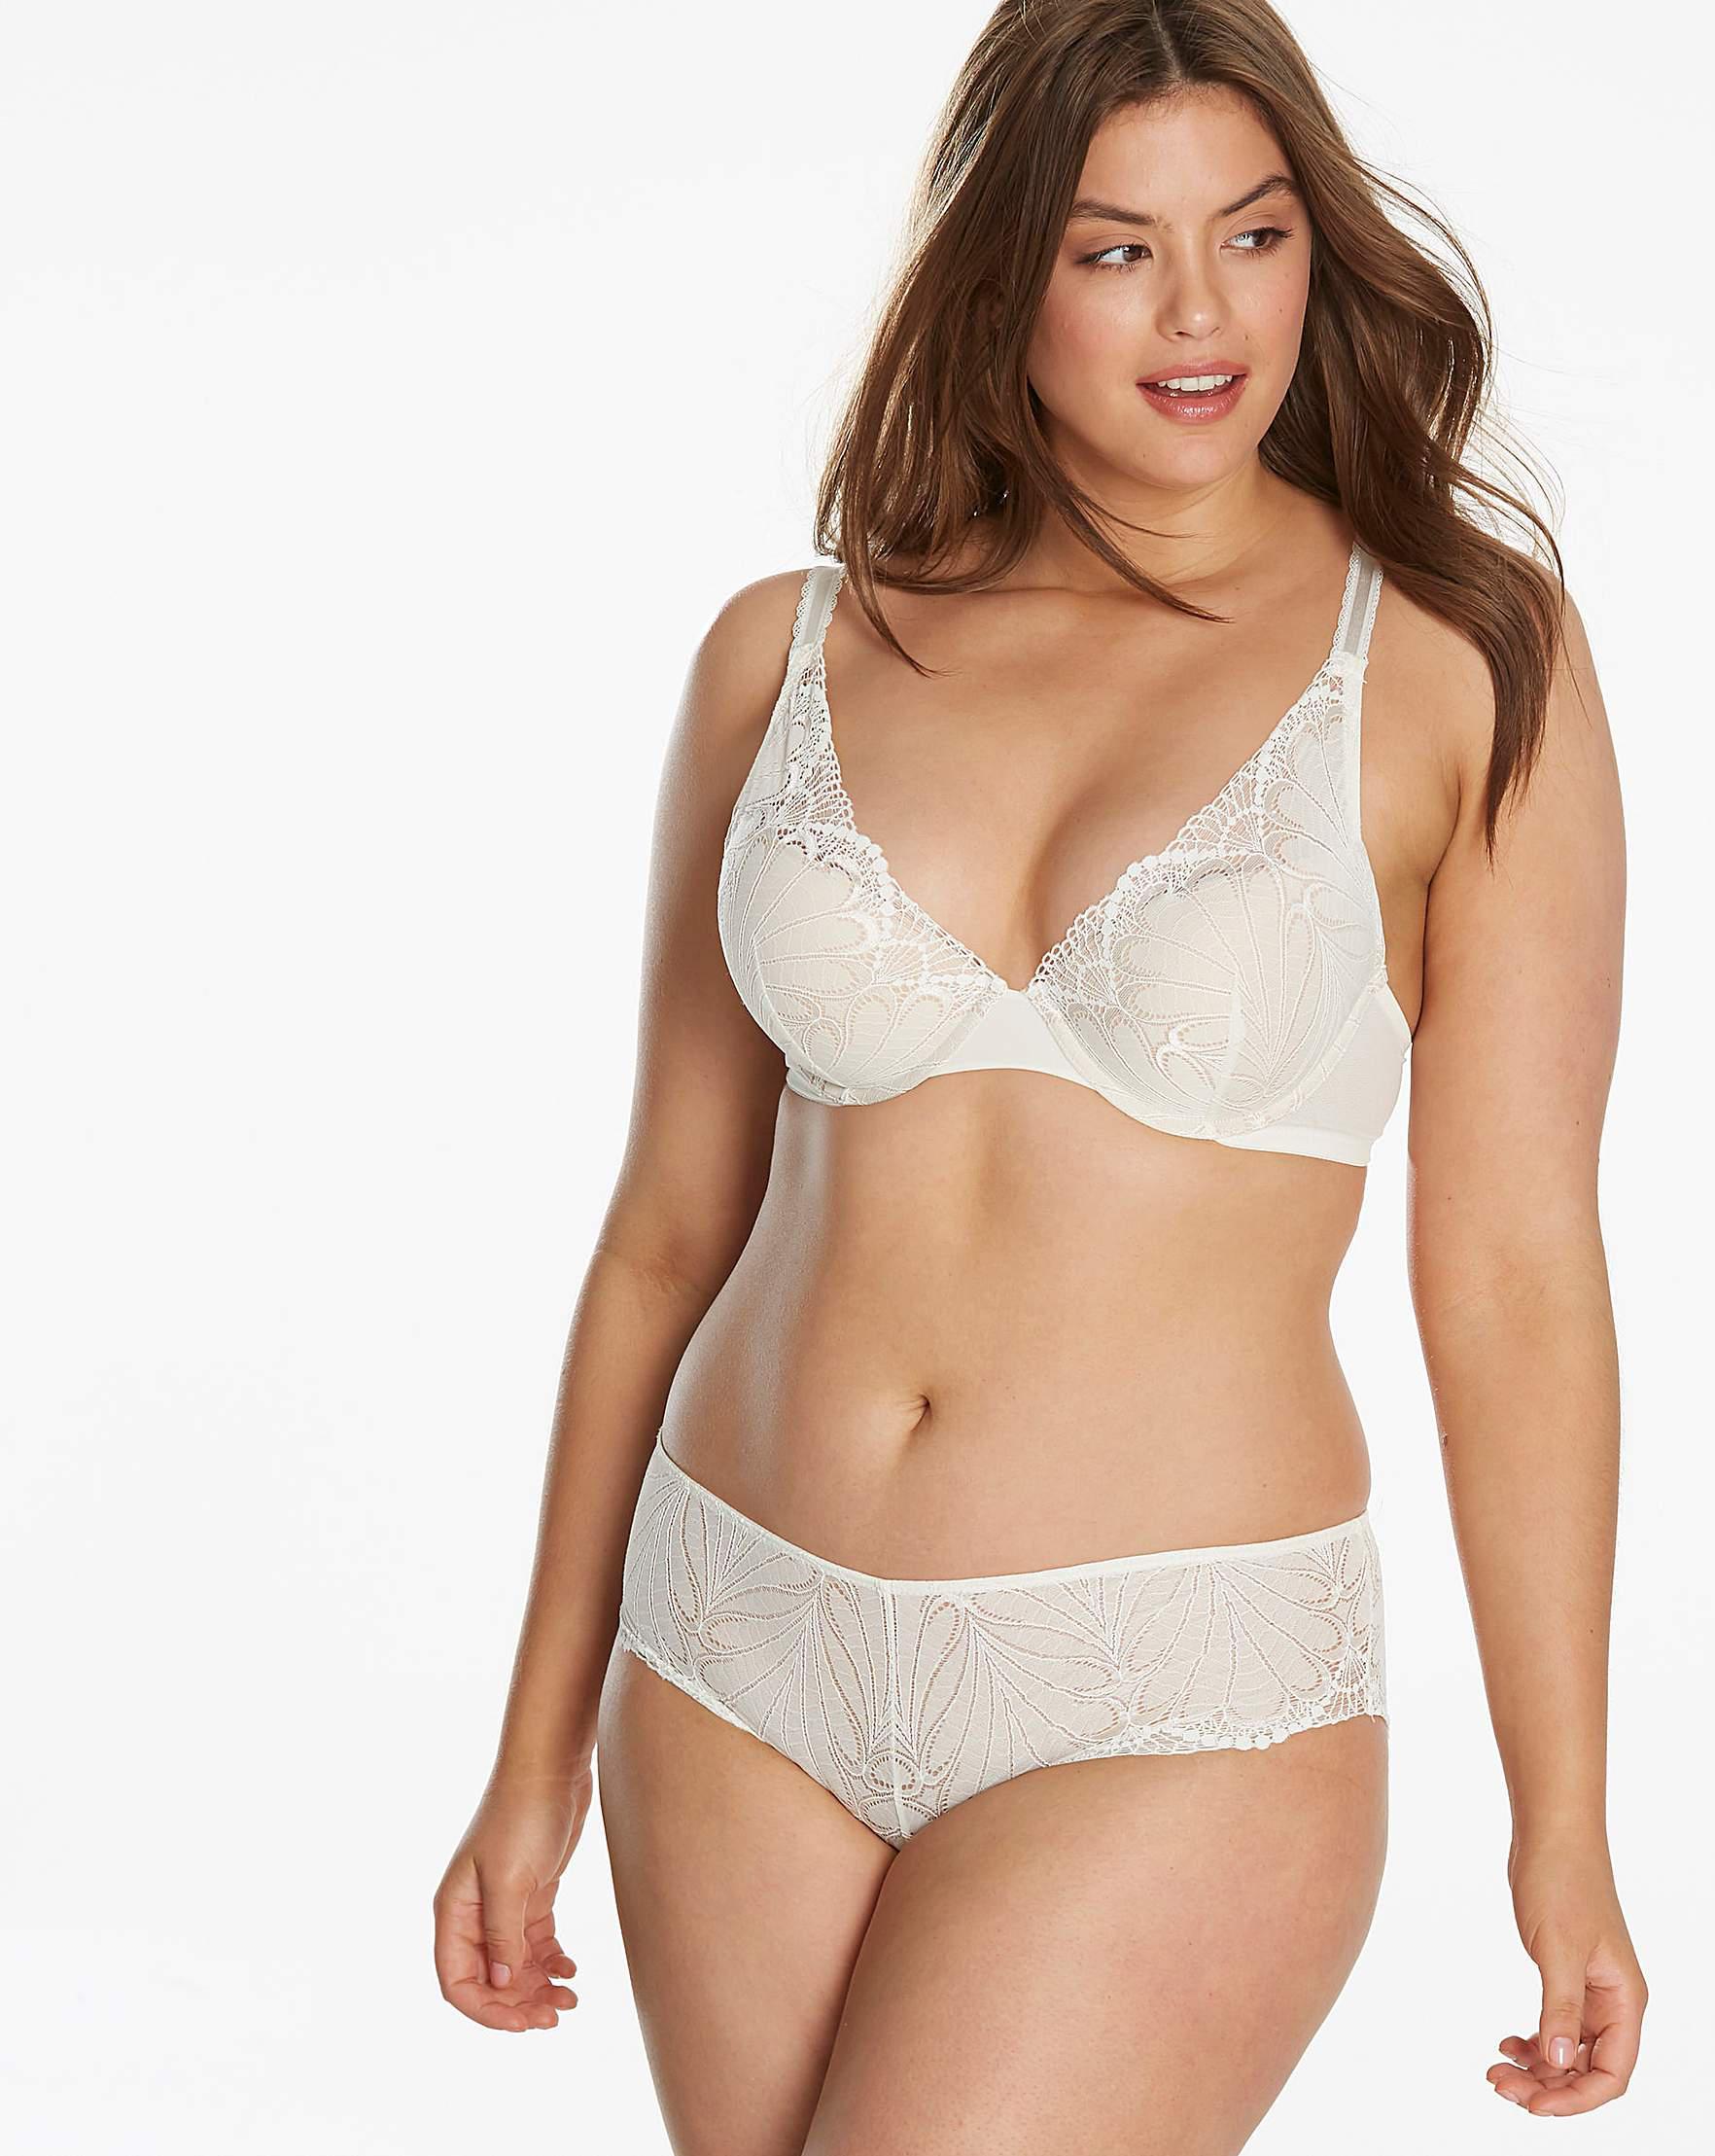 75156cfb45866 Wonderbra Refined Glamour Triangle Bra in White - Lyst